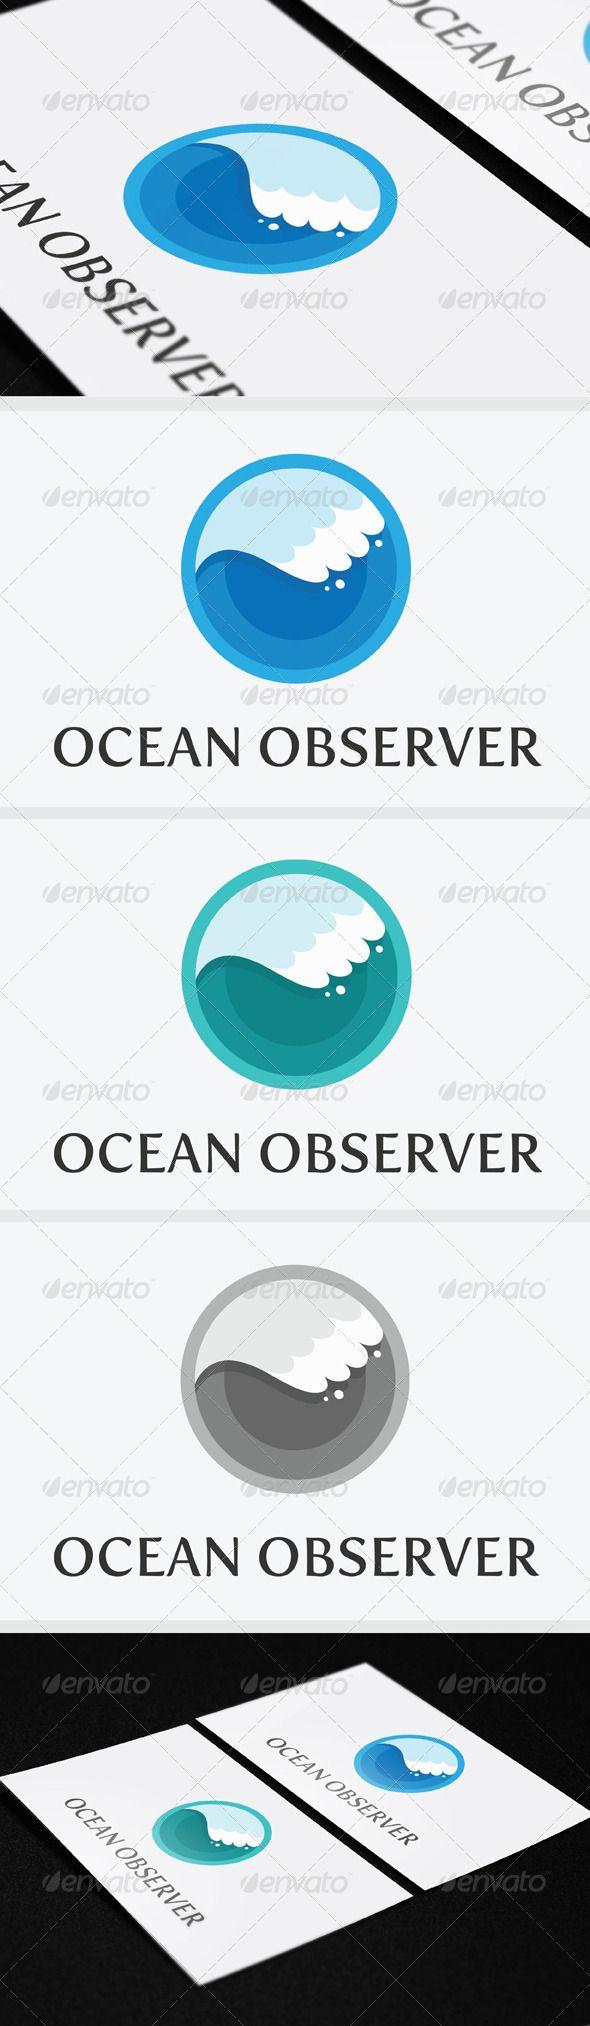 Ocean Observer Logo Template GraphicRiver Ocean Observer